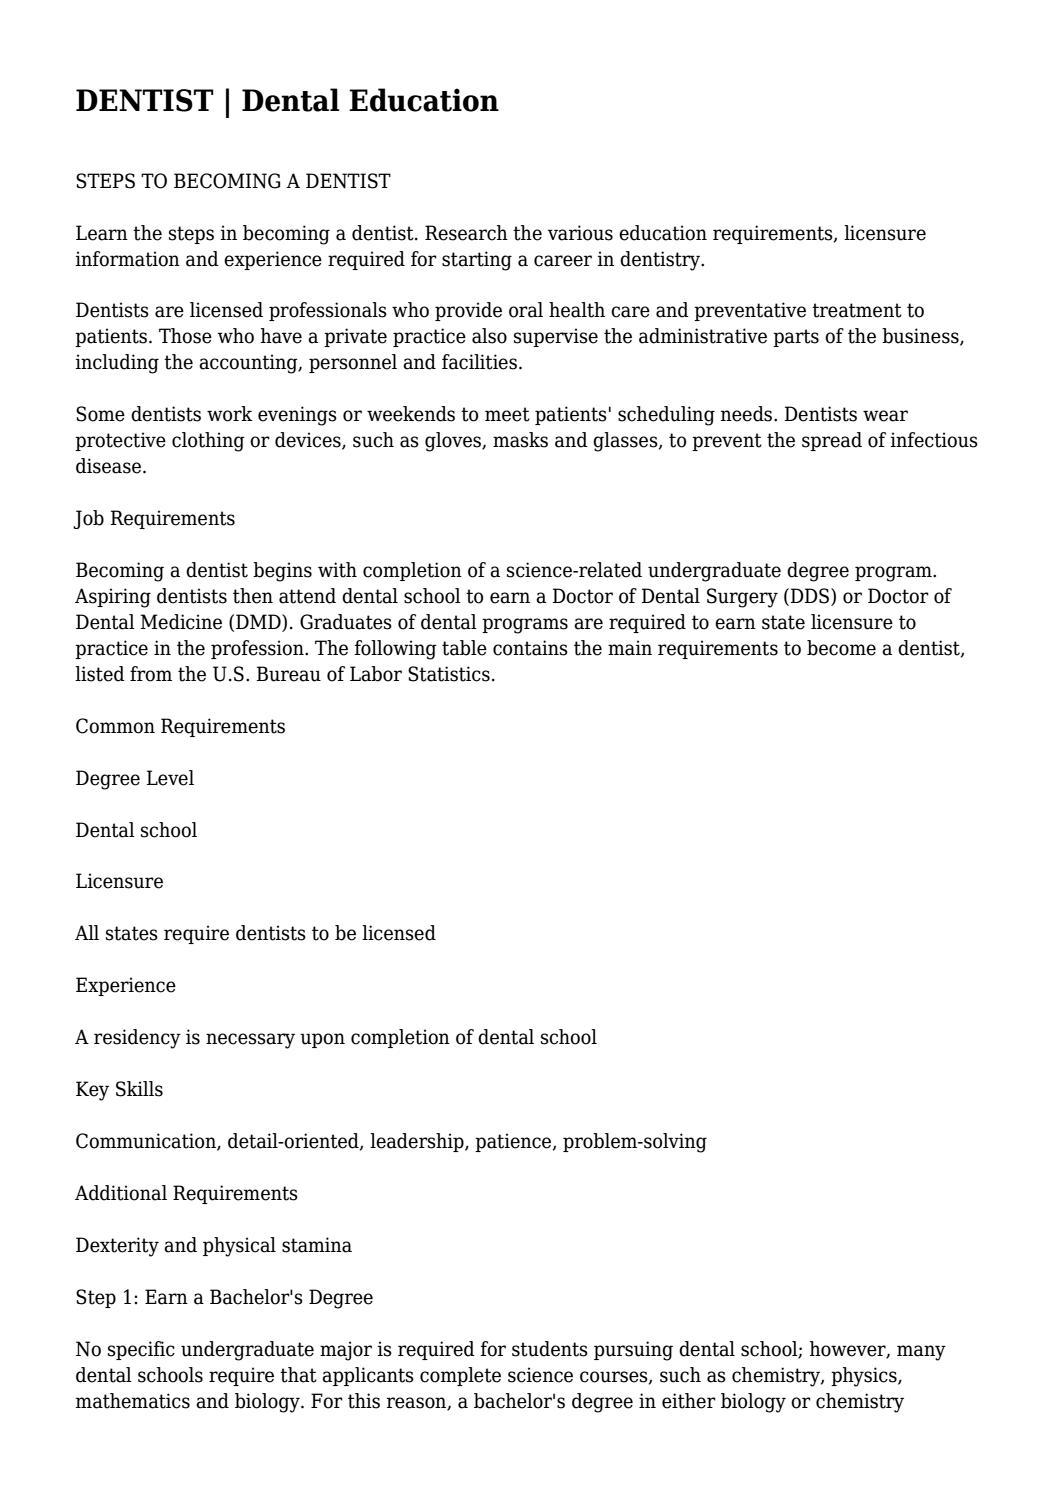 DENTIST | Dental Education    by worthlessinform08 - issuu